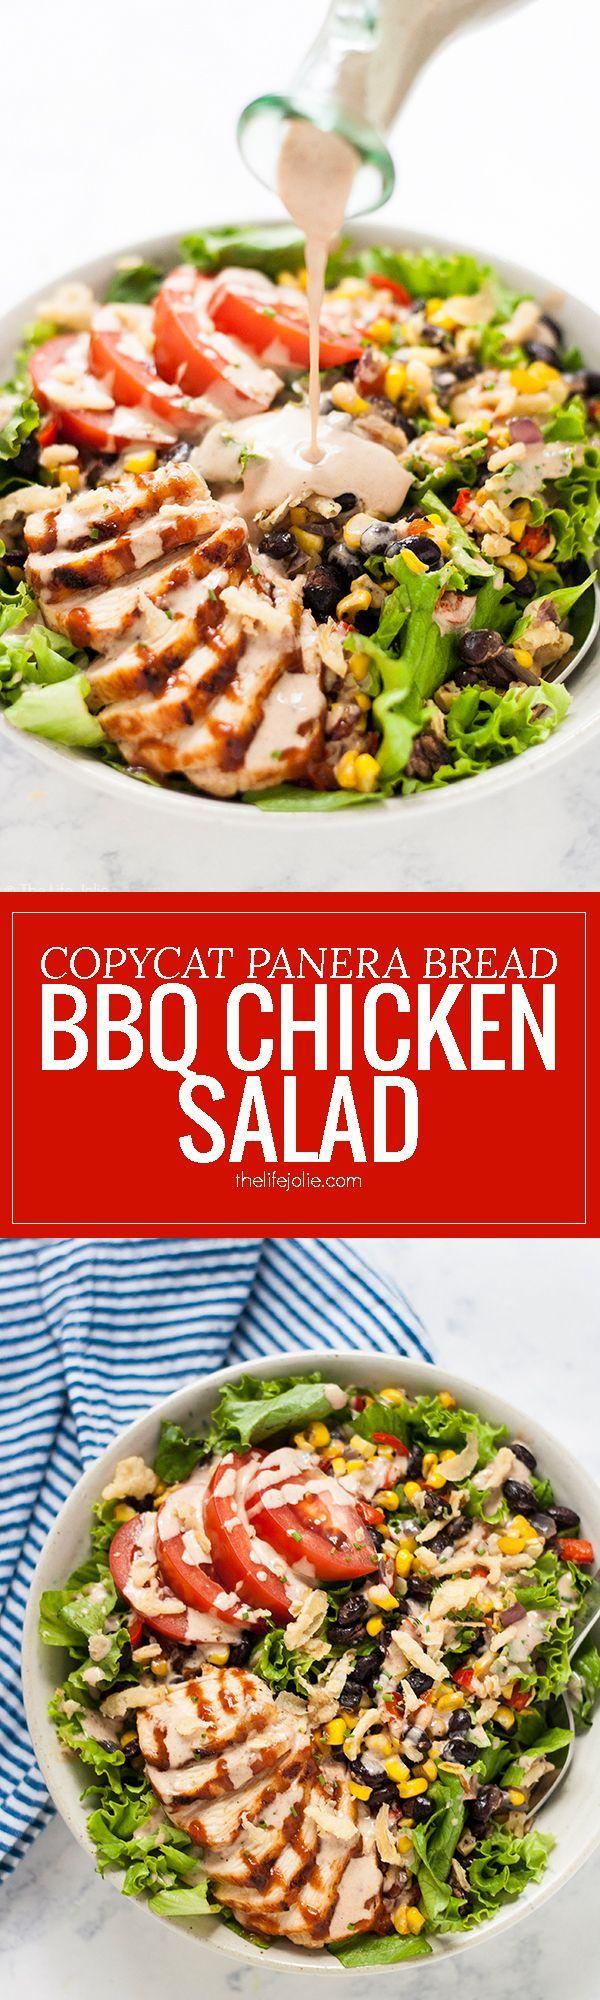 This Copycat Panera Bread BBQ Chicken Salad recipe…